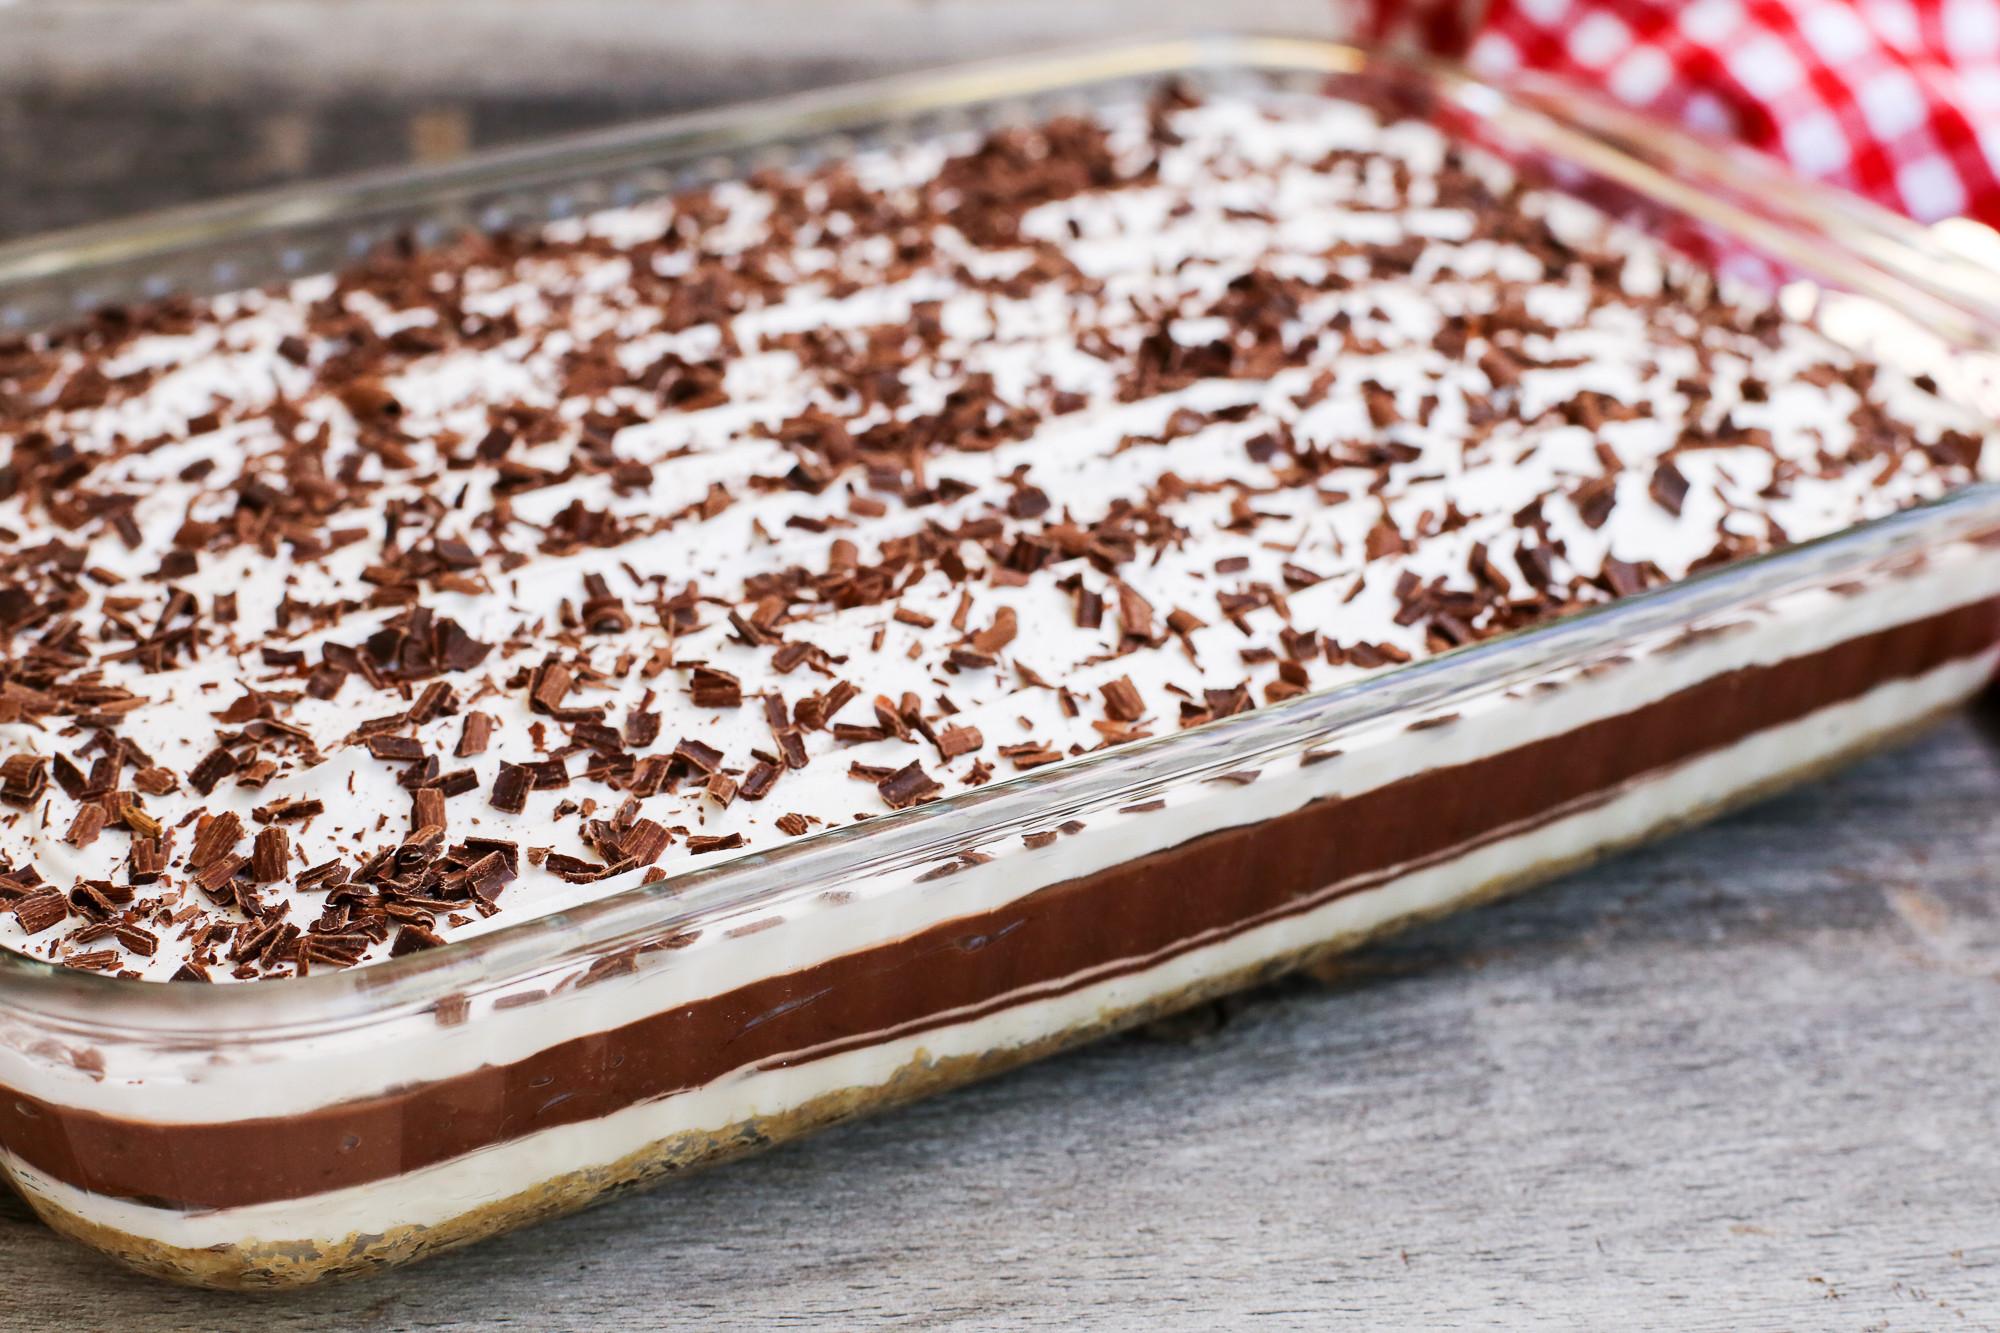 Layered Pudding Desserts  Layered Chocolate Pudding Dessert